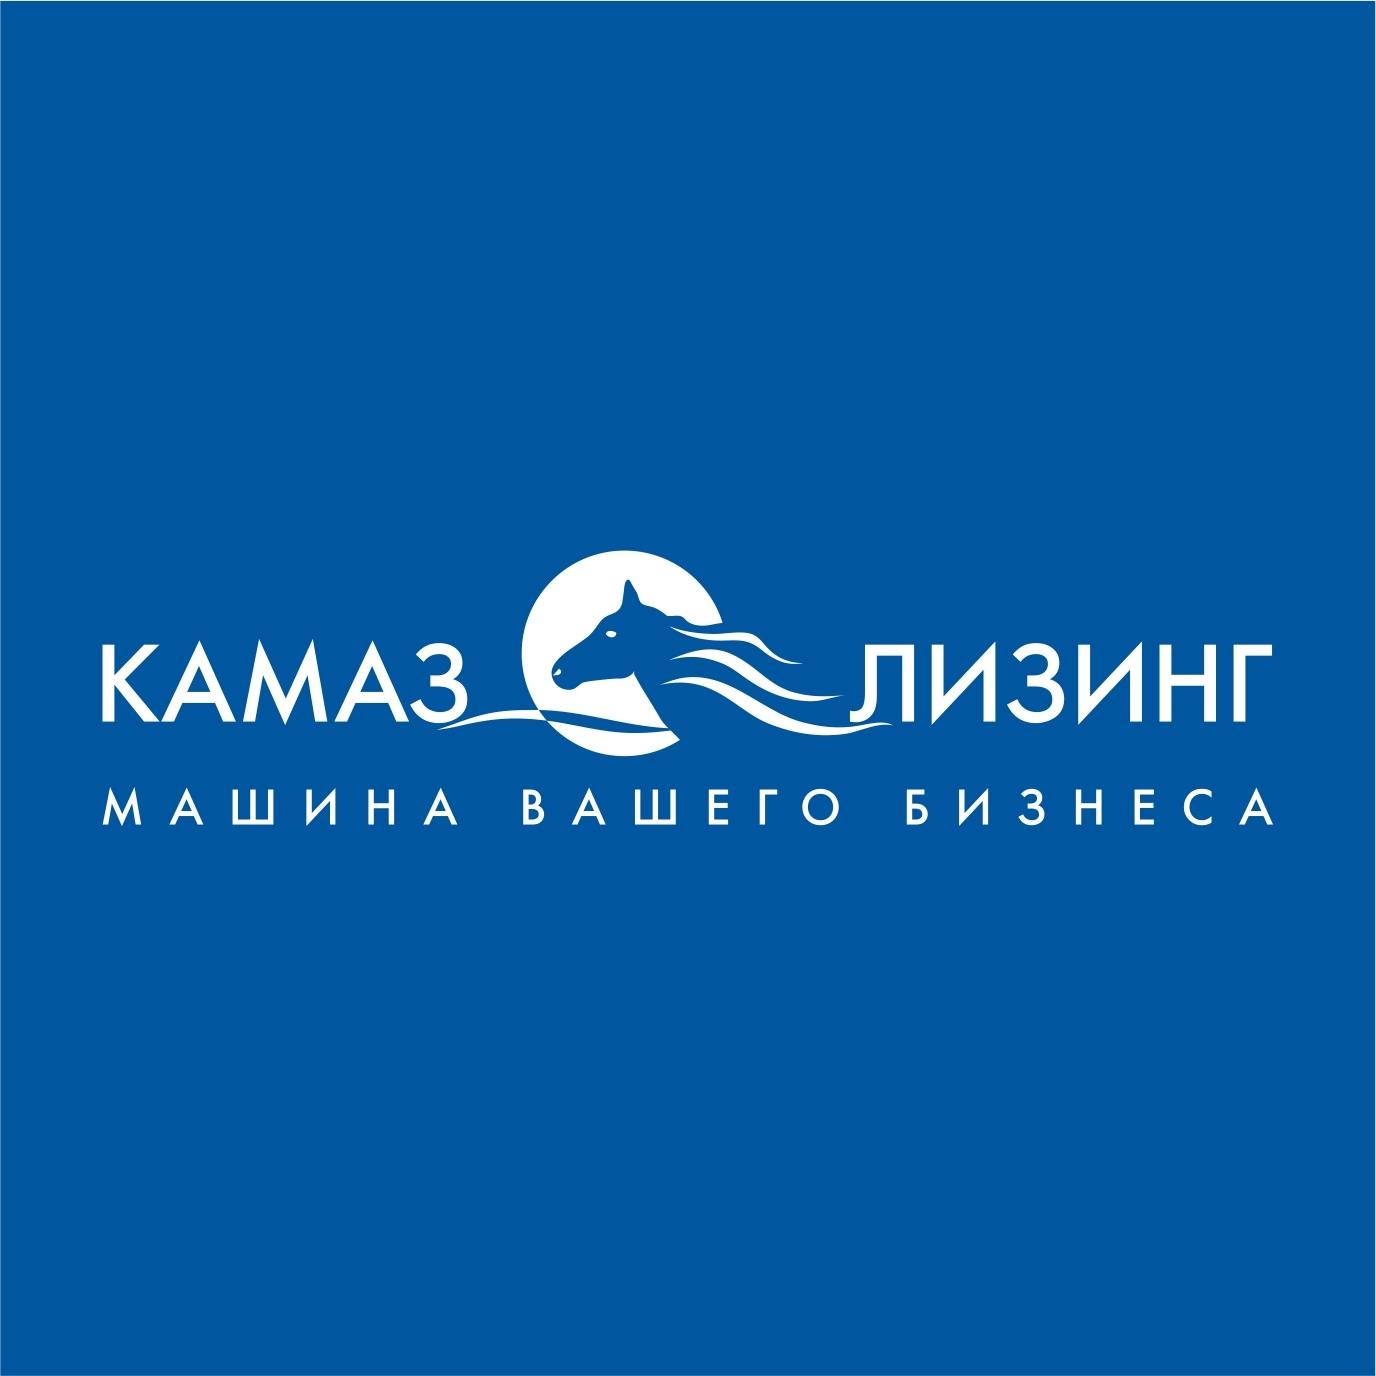 Электронный лизинг от «КАМАЗа»